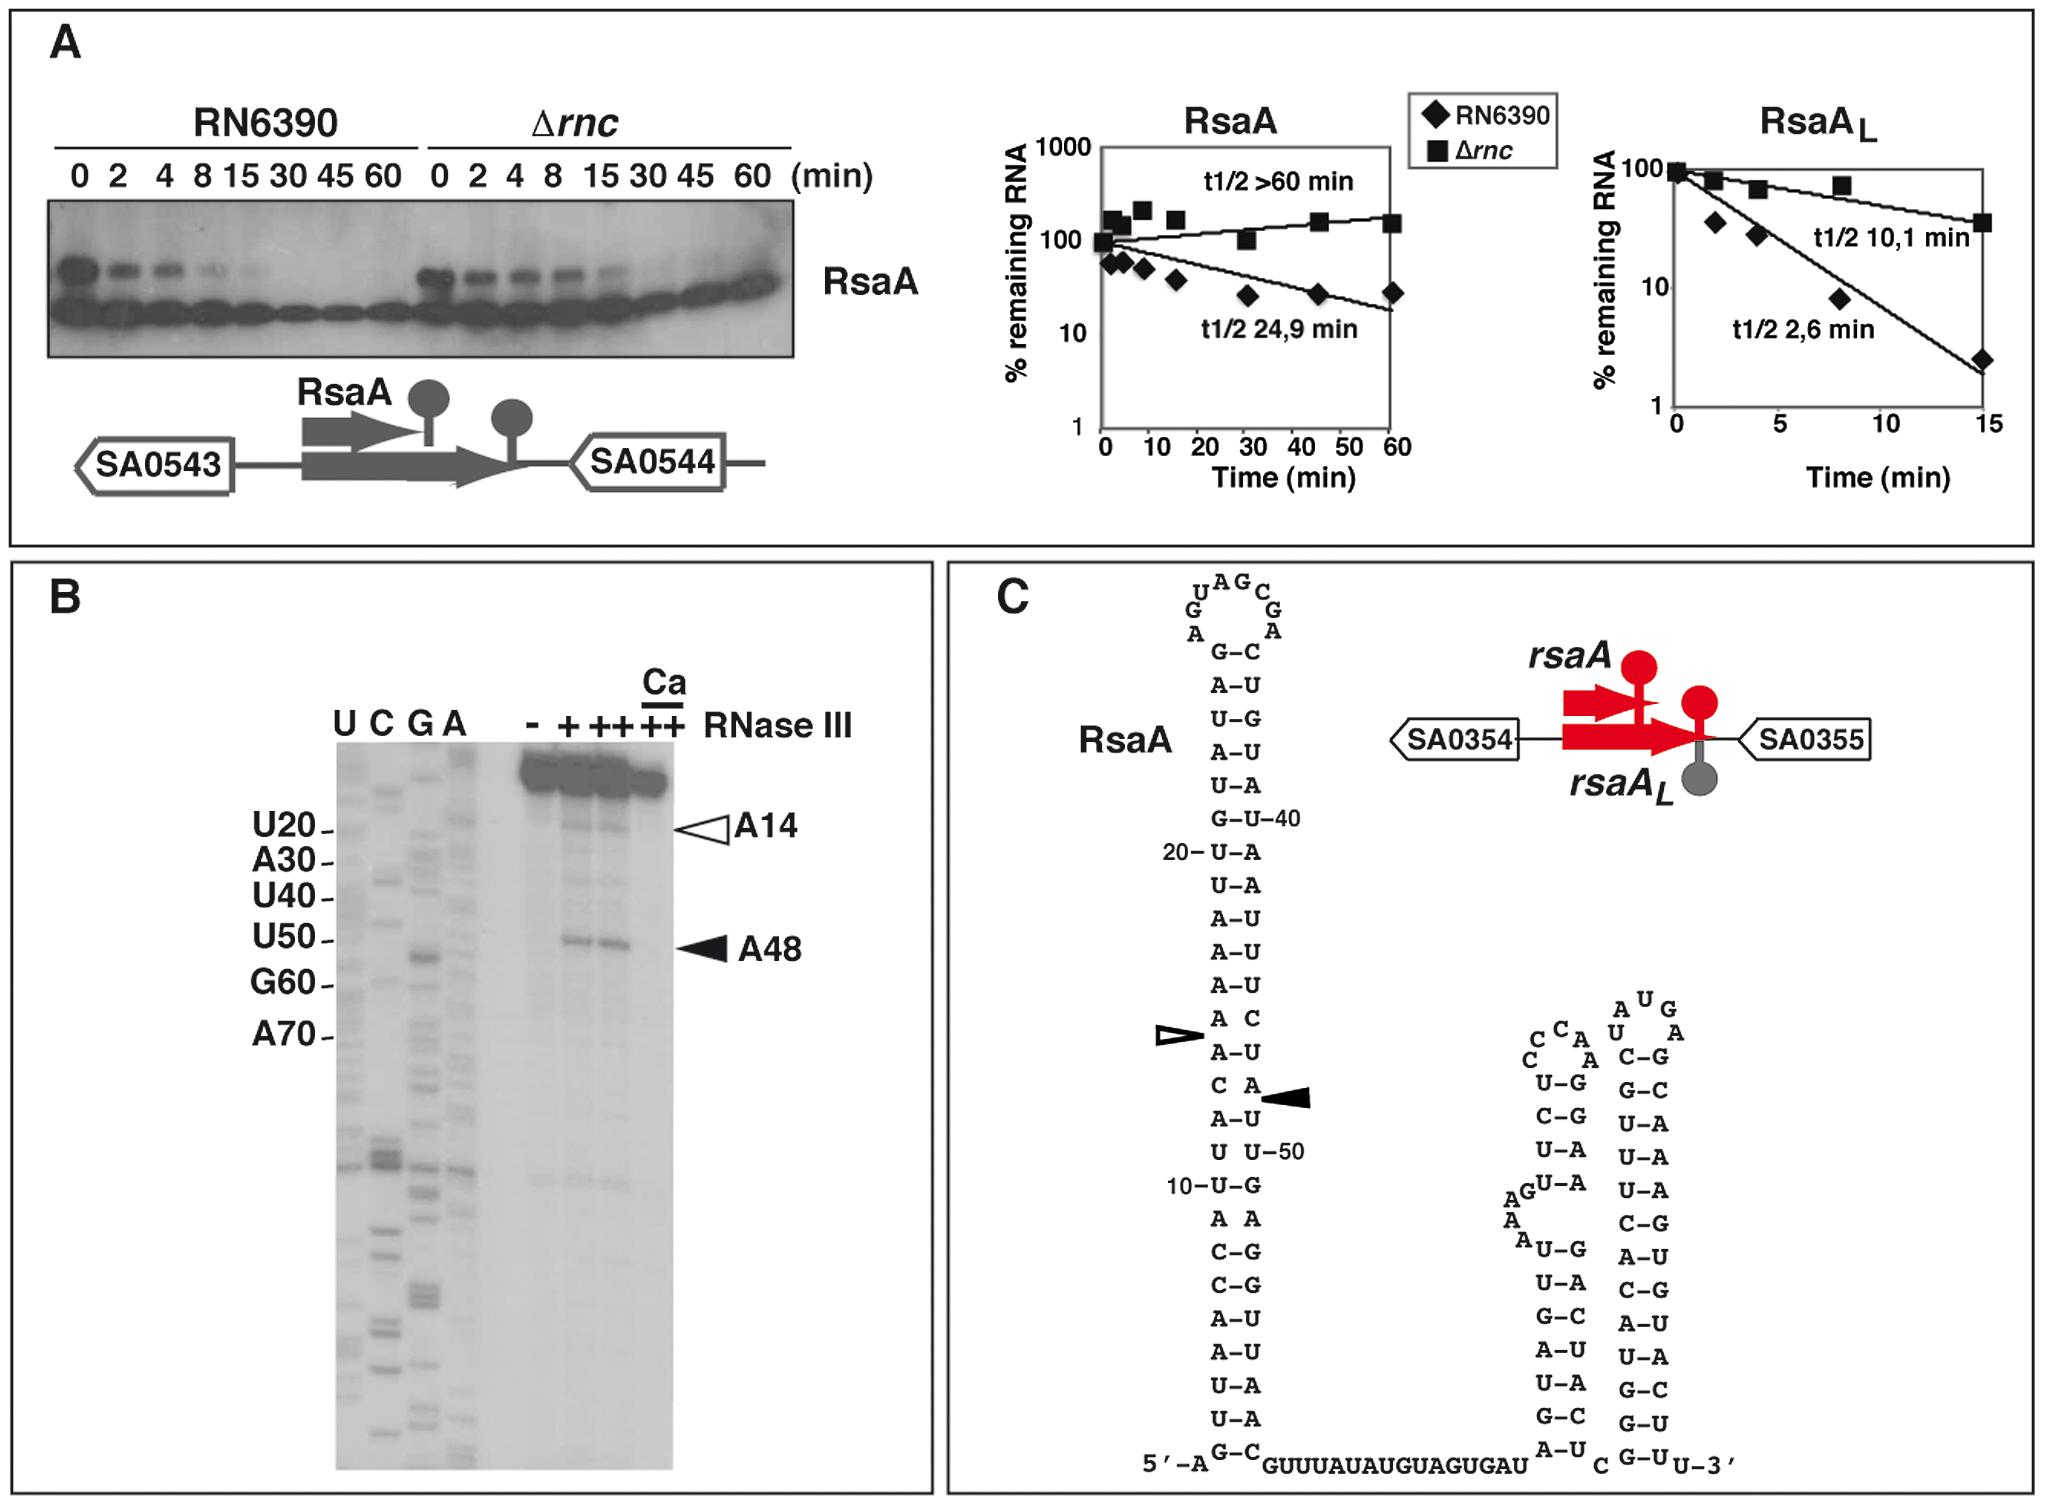 The ncRNA RsaA is a target of RNase III.